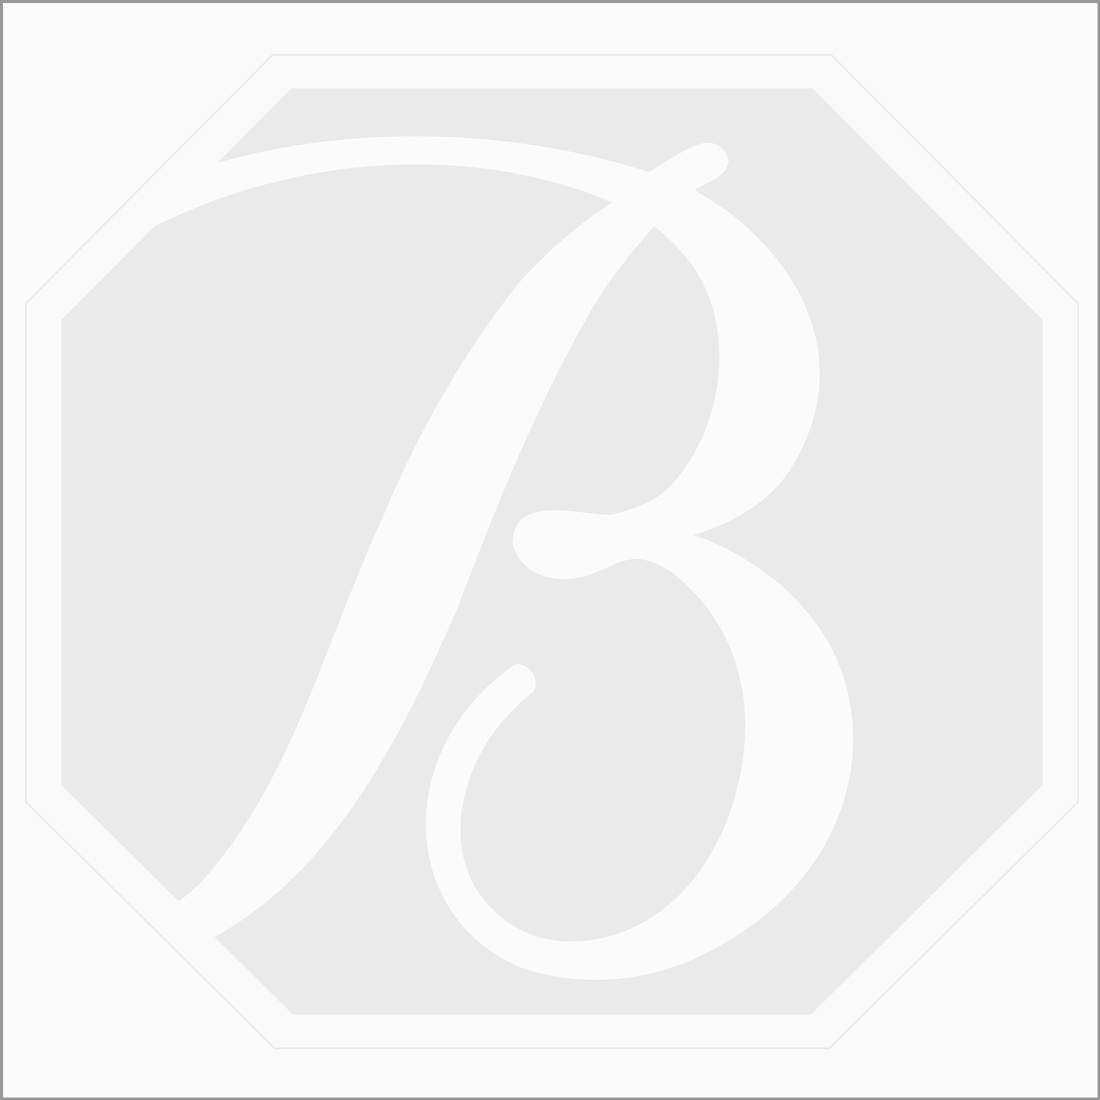 1 Pc - Dark Yellow Tourmaline Rose Cut - 9.56 ct. - 23 x 17 x 3 mm (TRC1053)